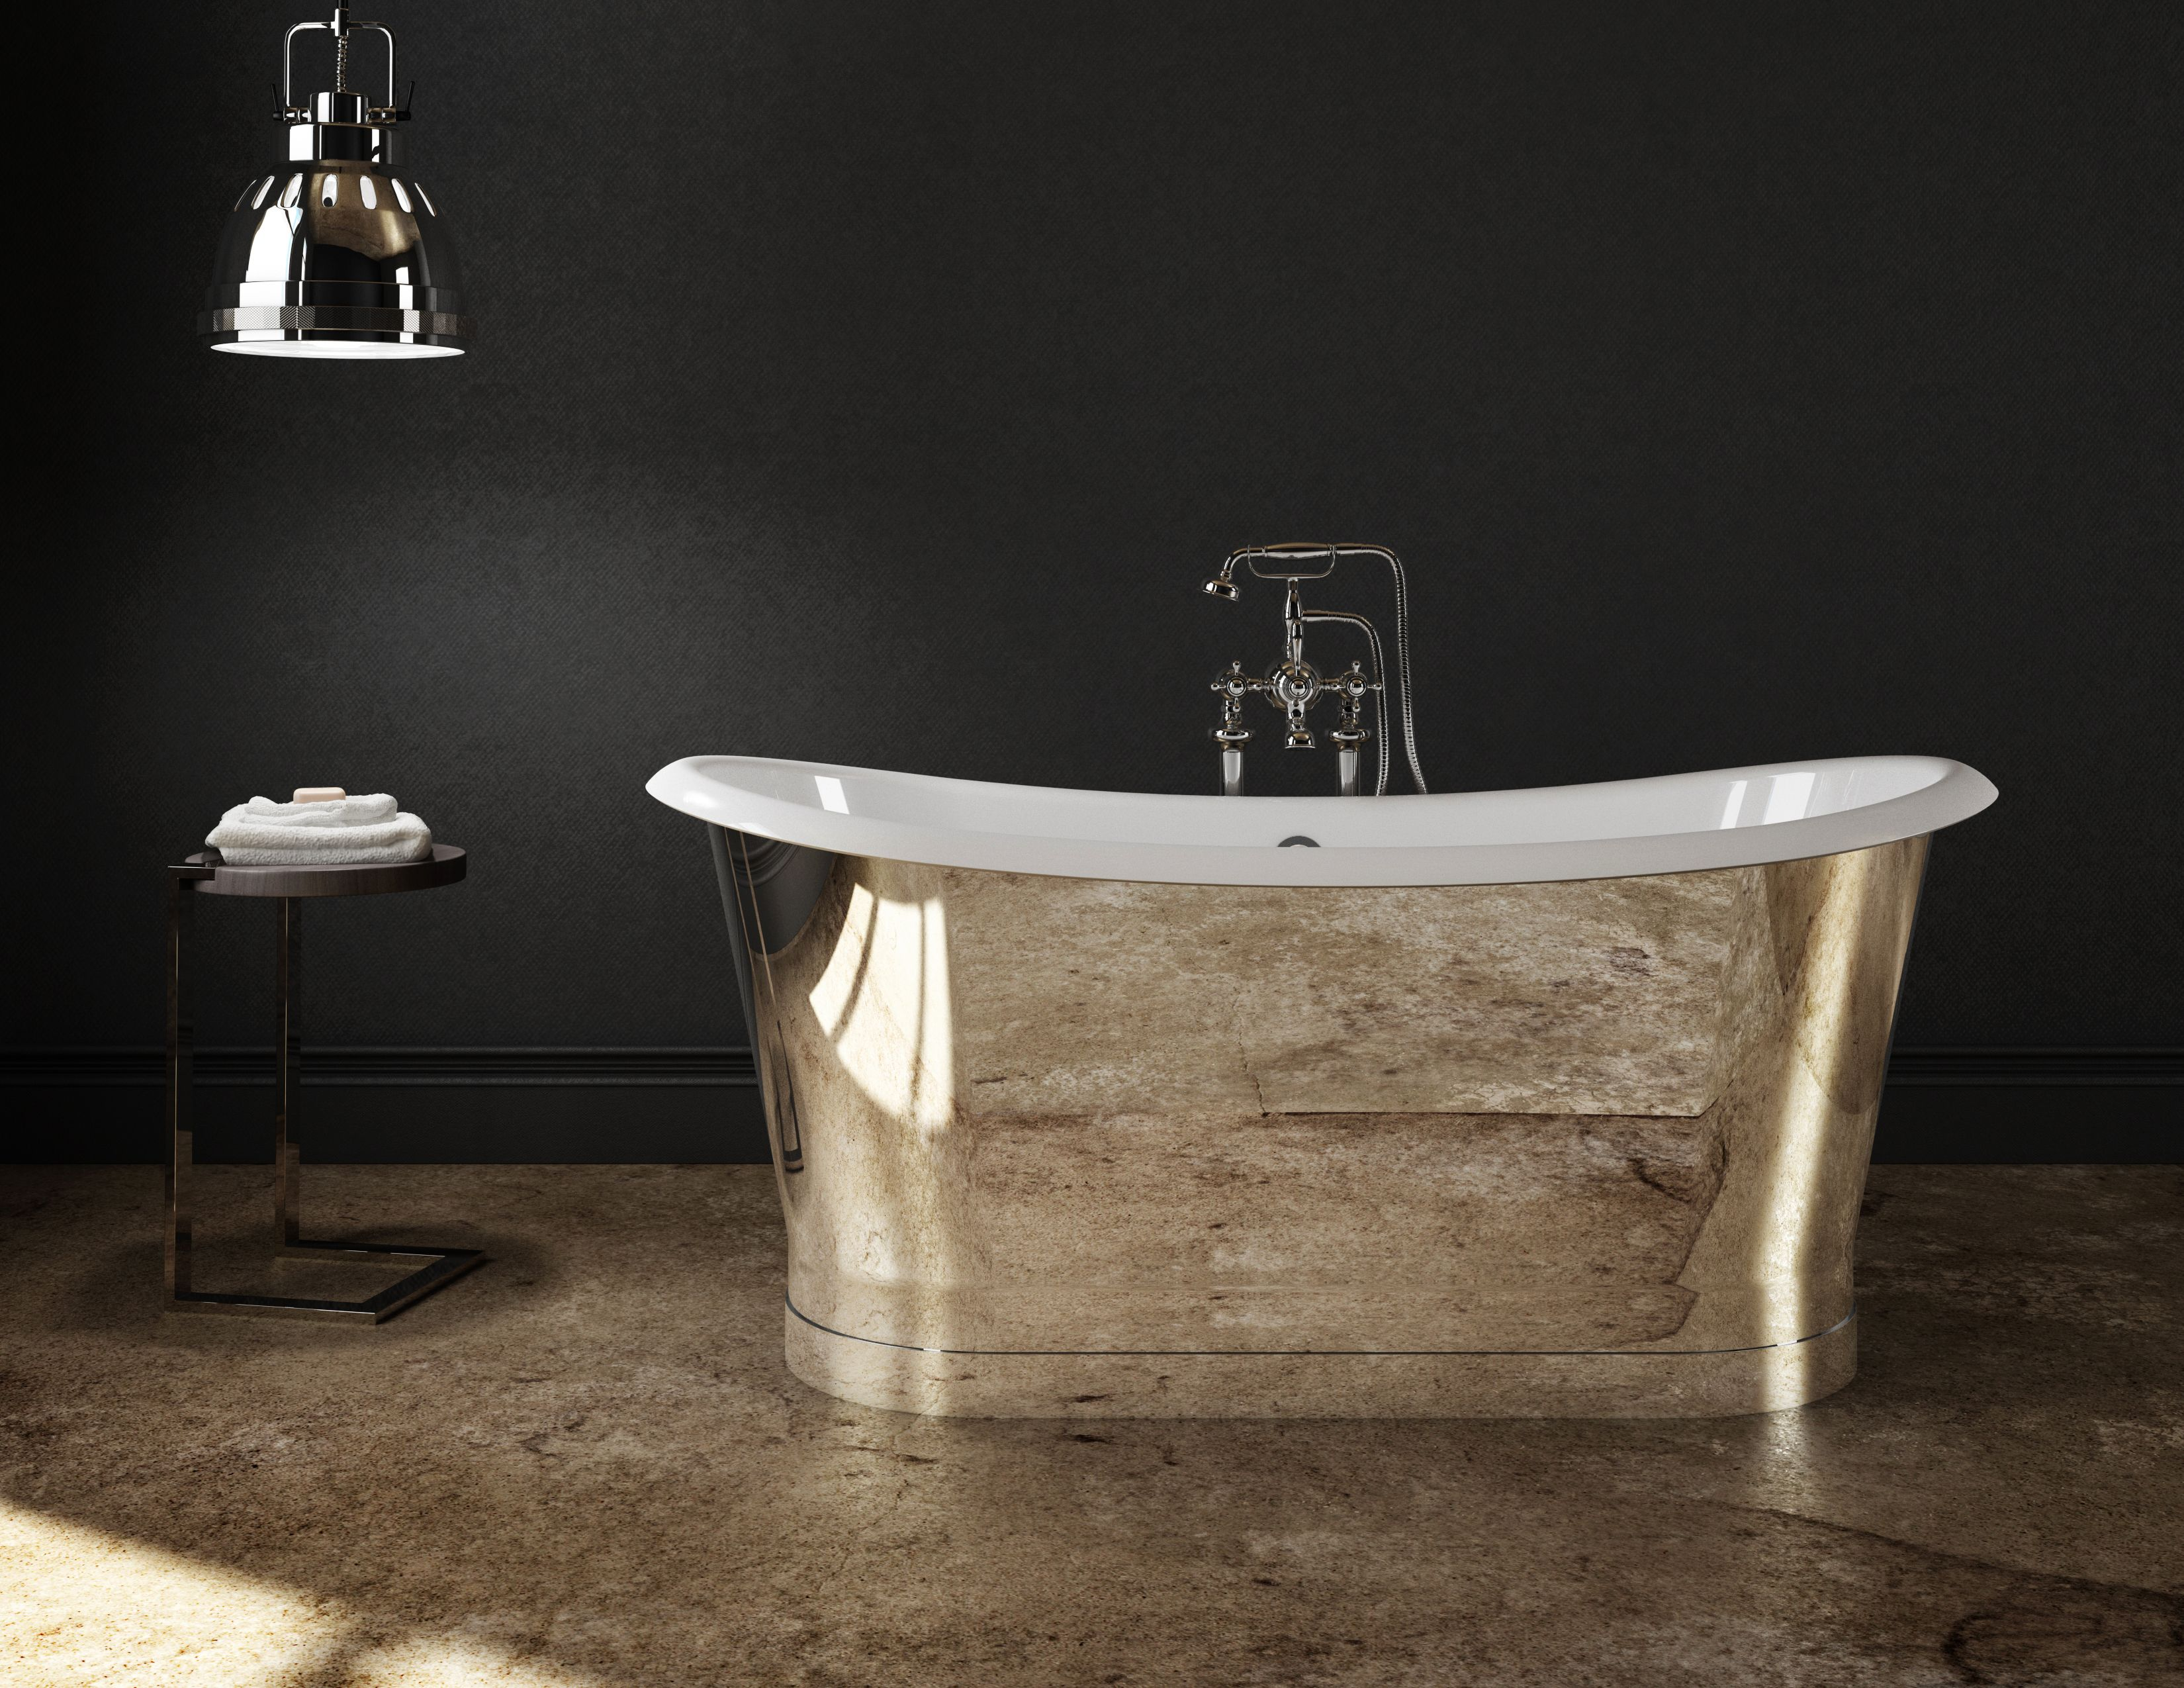 Cast Iron Freestanding Bathtub Mirror Finish Stainless